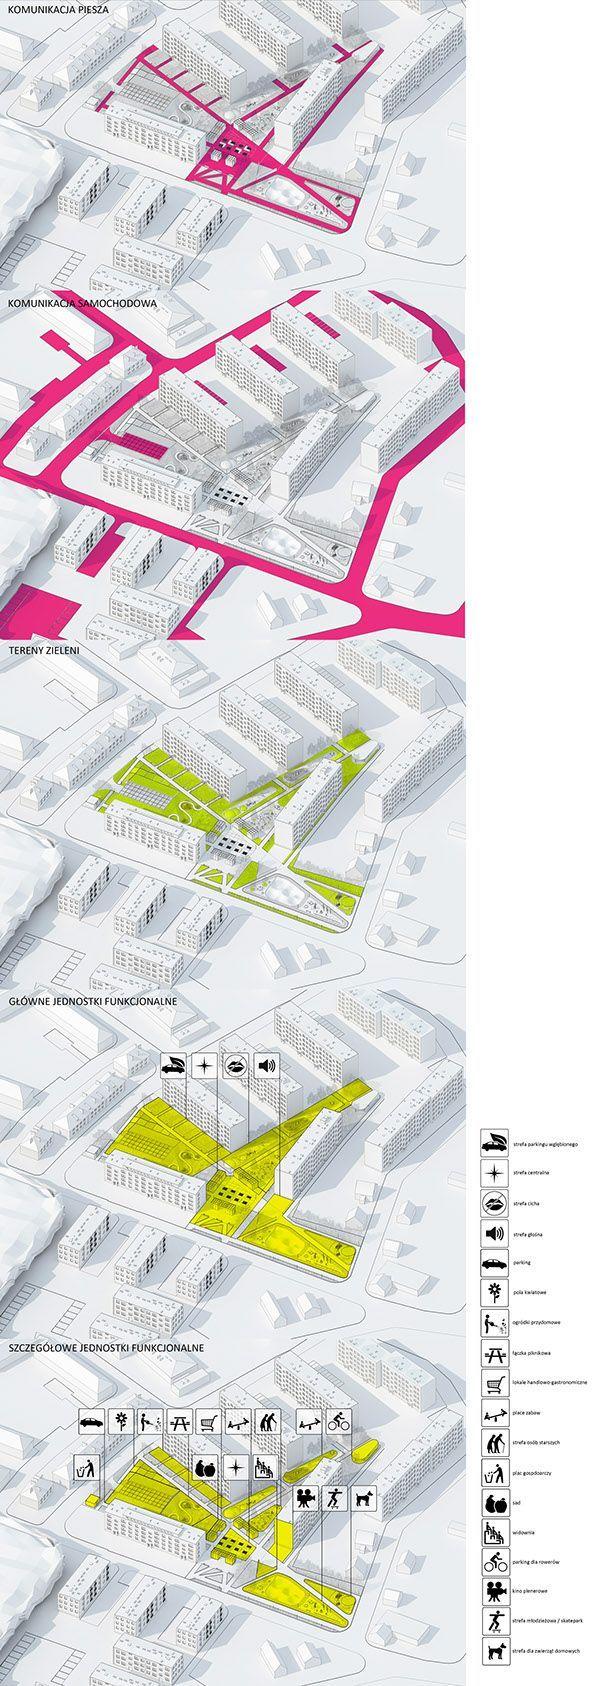 Square redevelopment in Kuznia Raciborska on Behance: